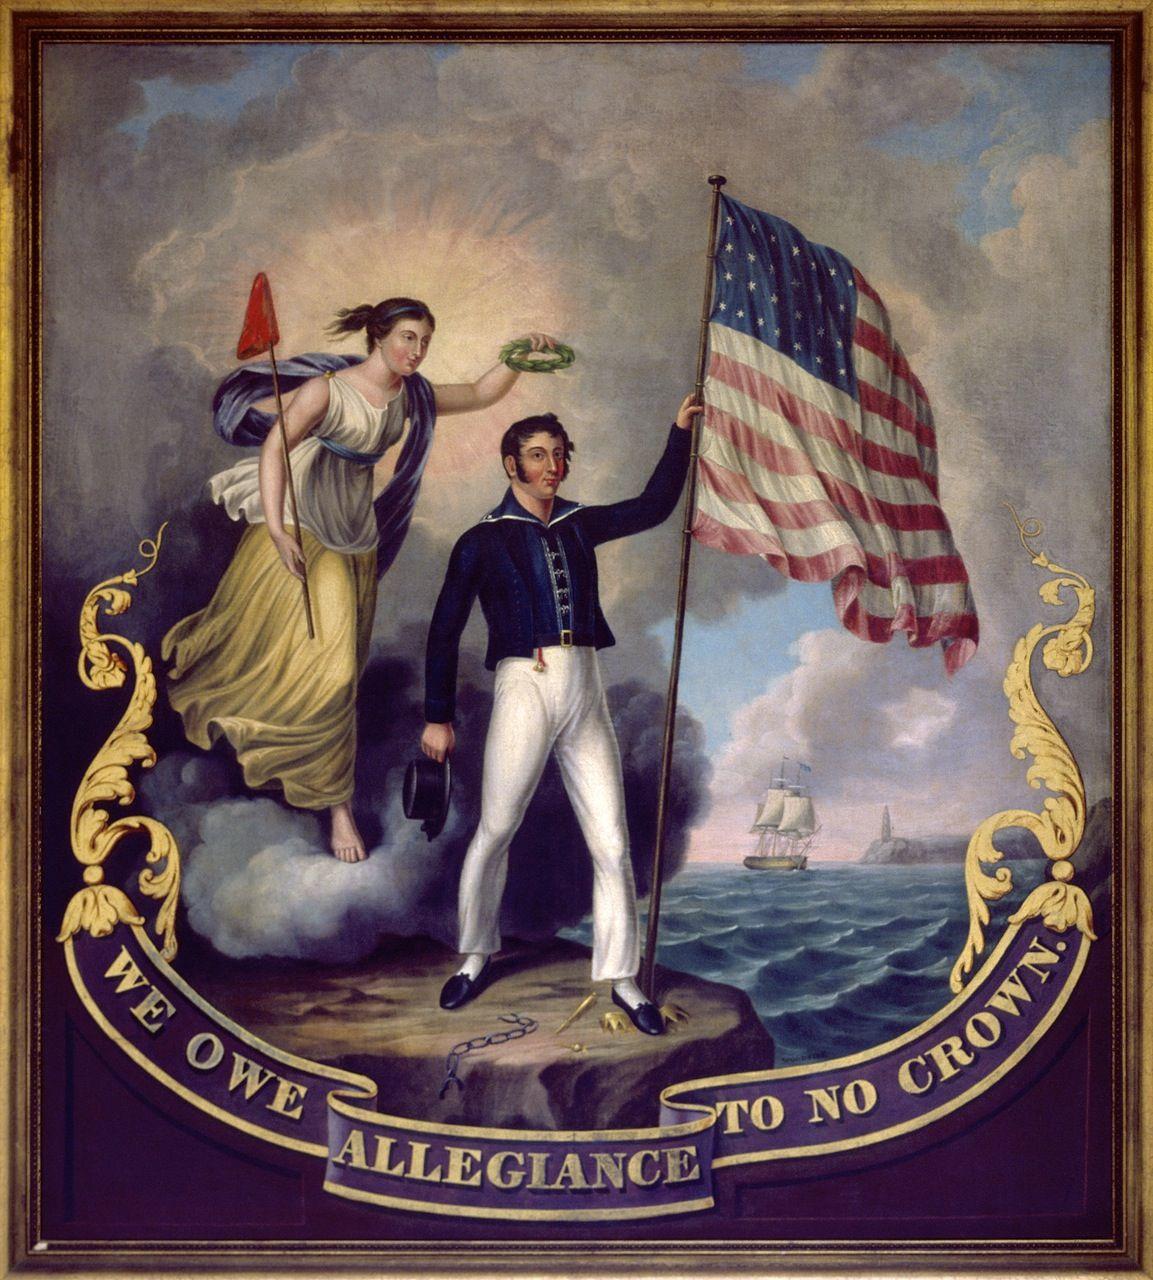 Owe Allegiance Crown Americana Print & Type